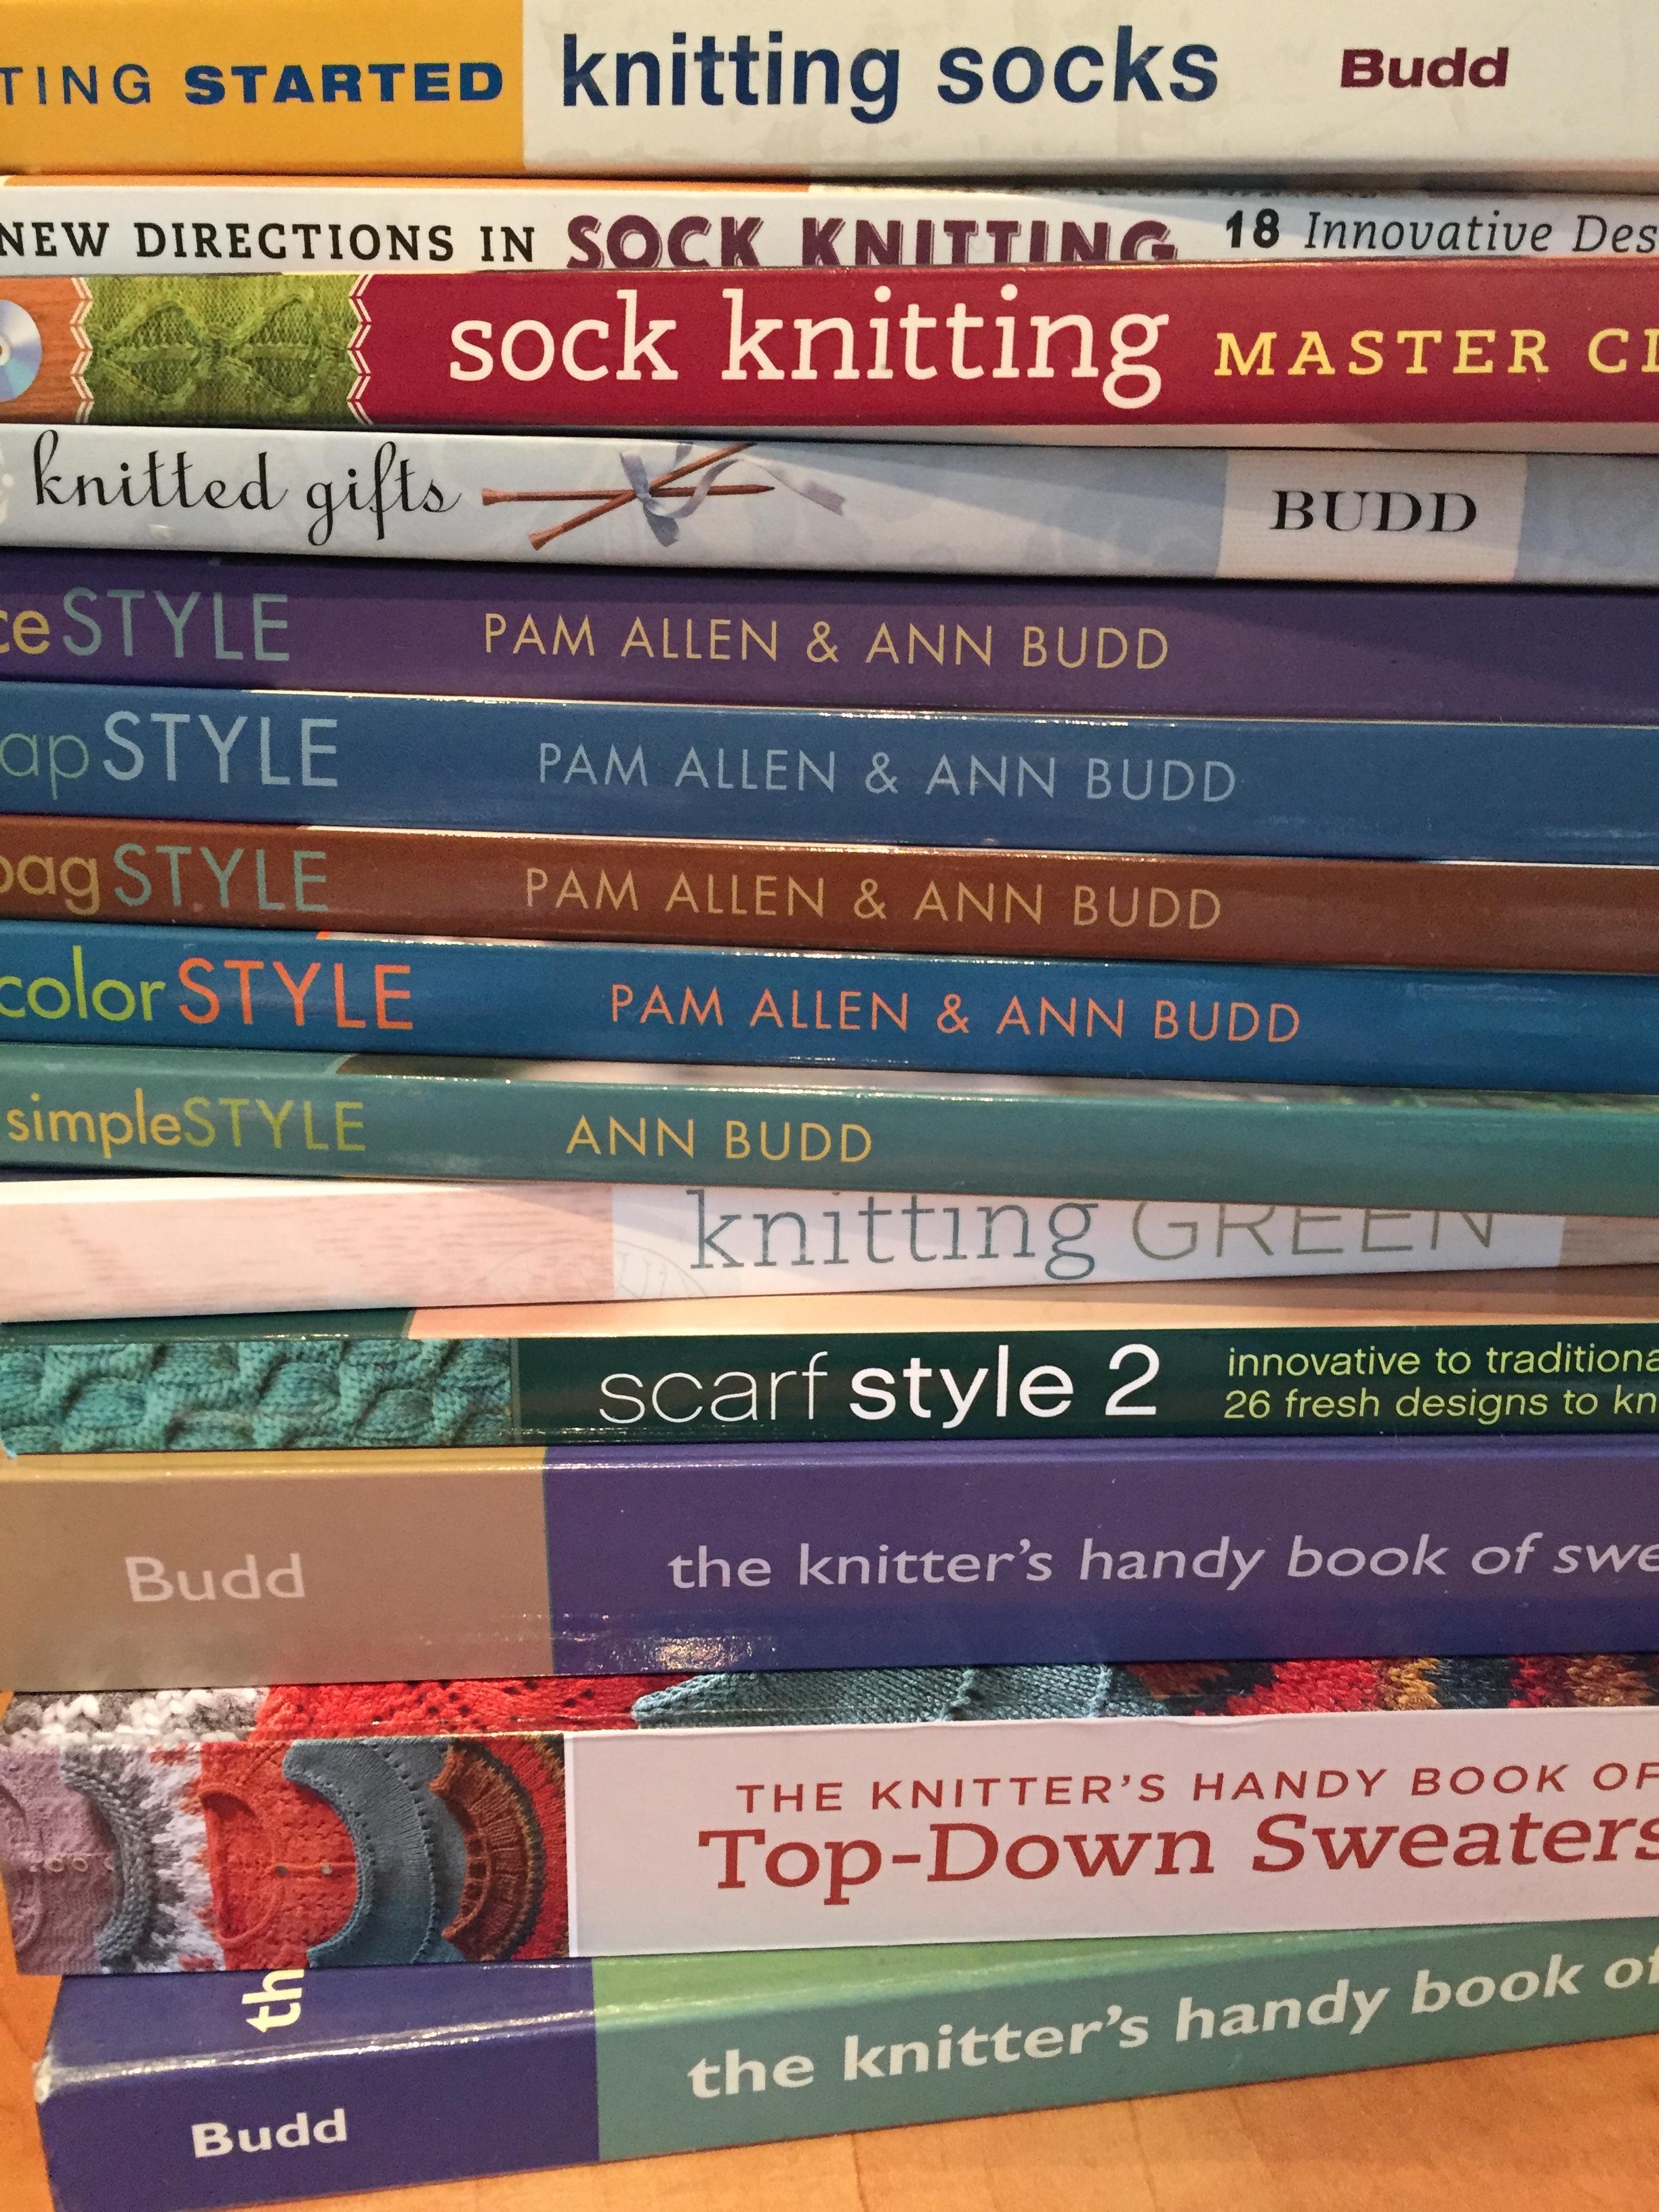 f49f64693 Getting Started Knitting Socks